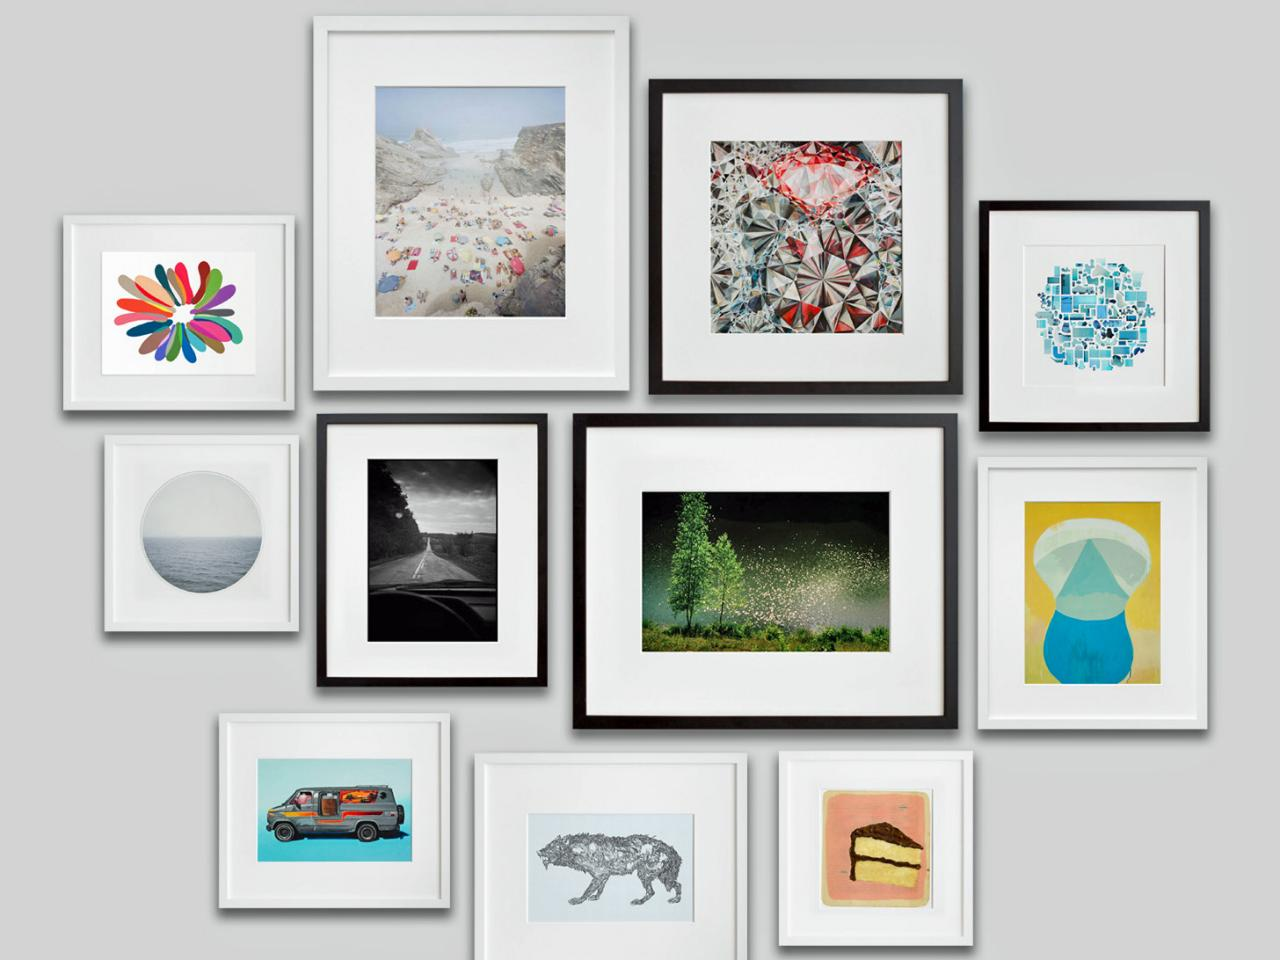 Original_Jeanine-Hays-Gallery-Wall-2-20x200-White-Mats-Black-Frames_s4x3.jpg.rend.hgtvcom.1280.960